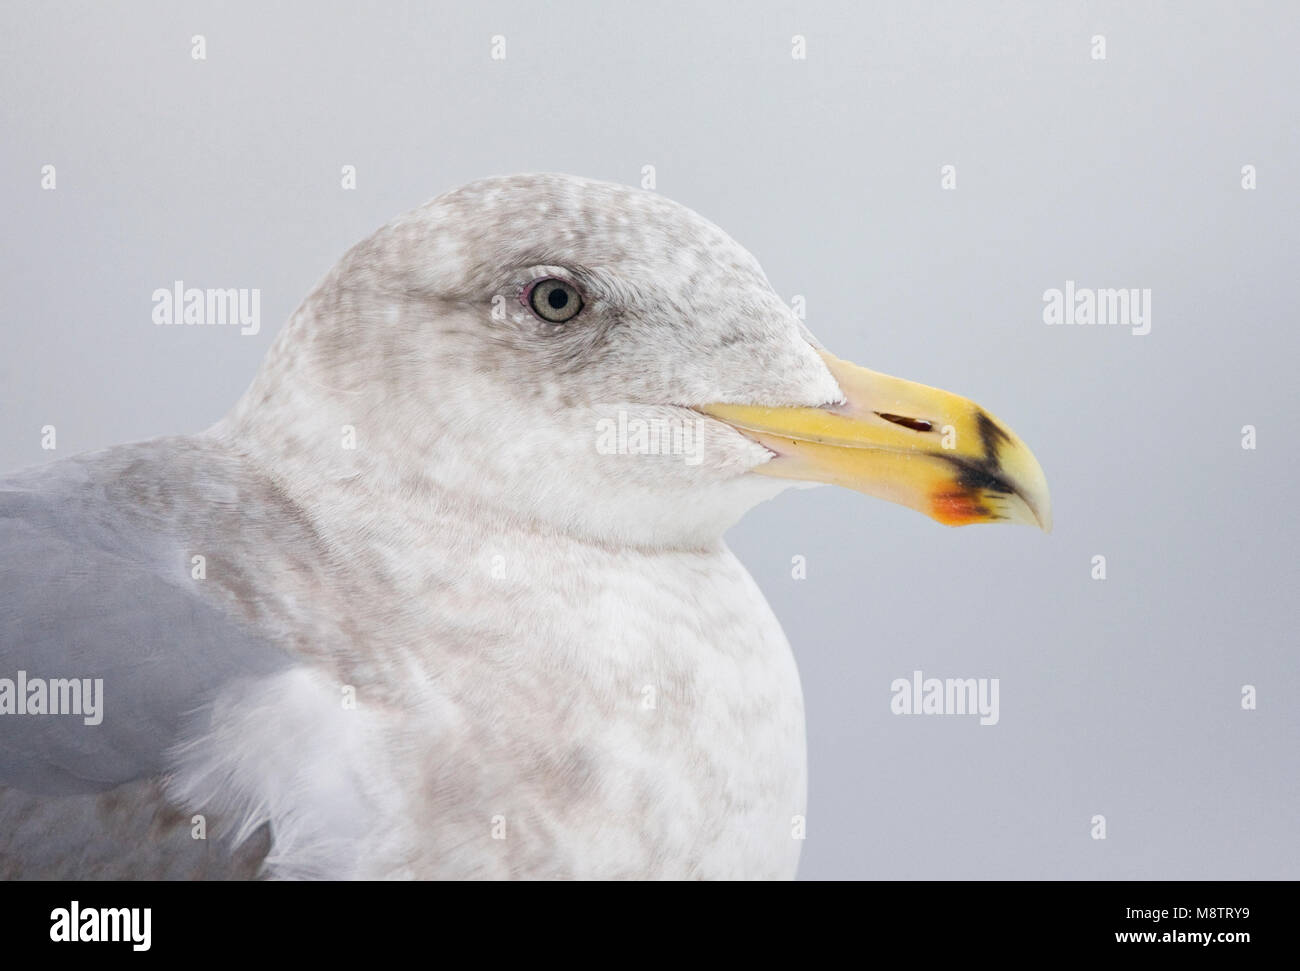 Beringmeeuw close-up; Glaucous-winged Gull portrait - Stock Image